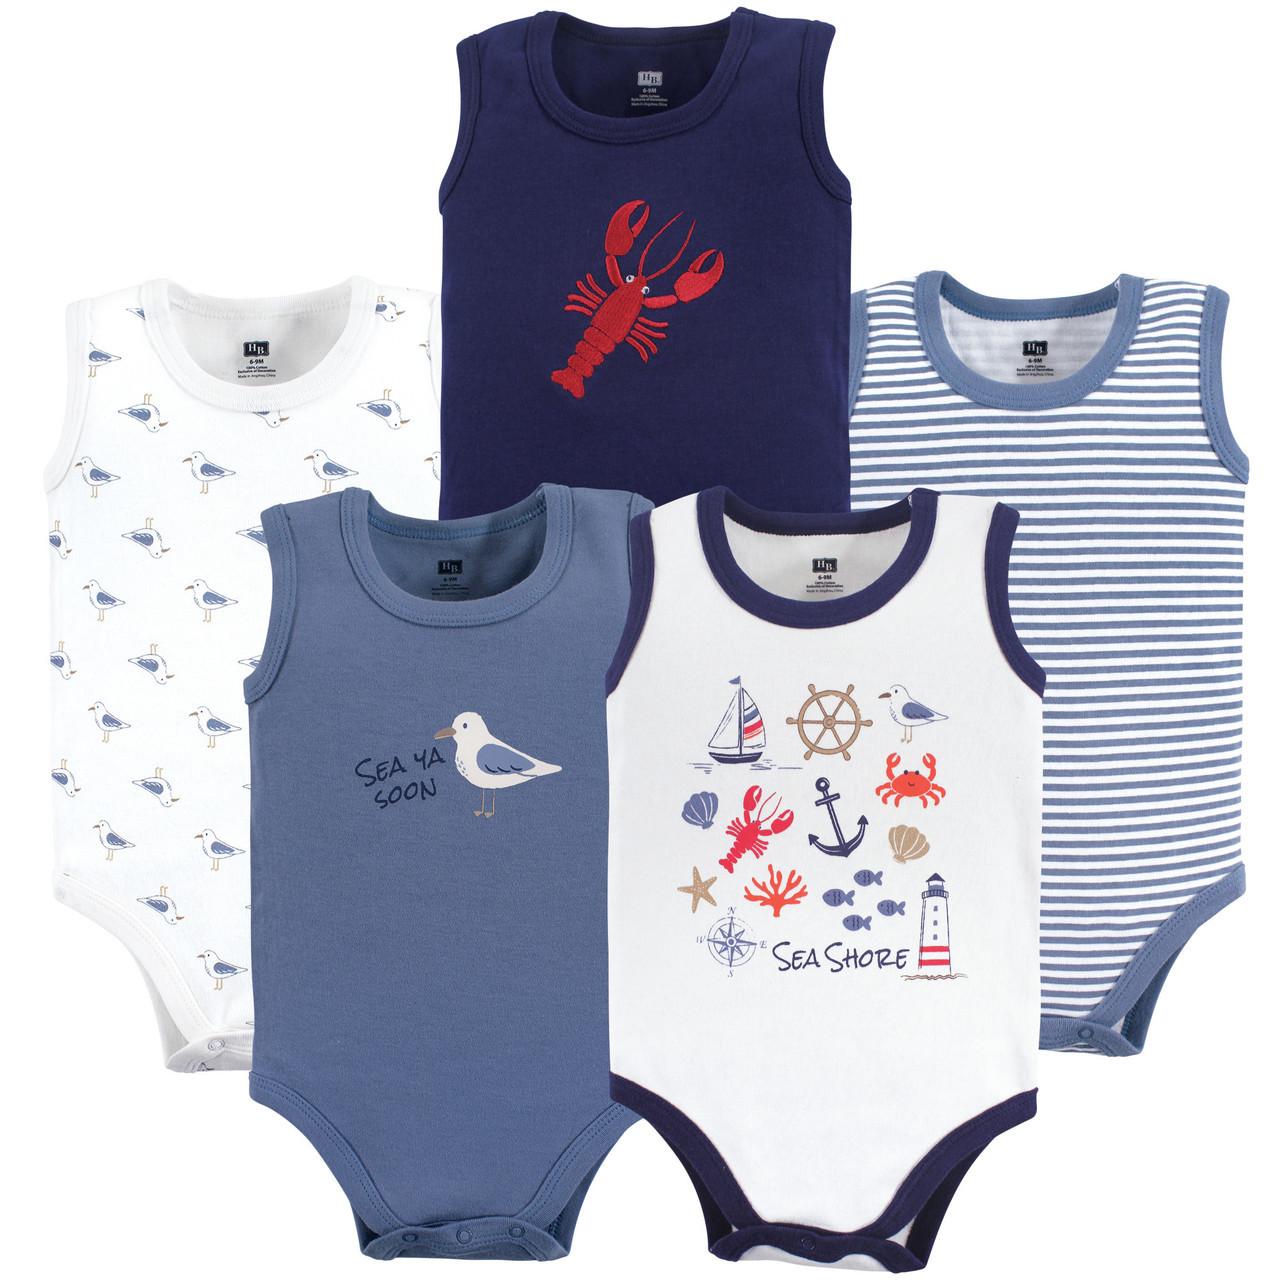 Cactus 5-Pack Hudson Baby Boy Sleeveless Bodysuits